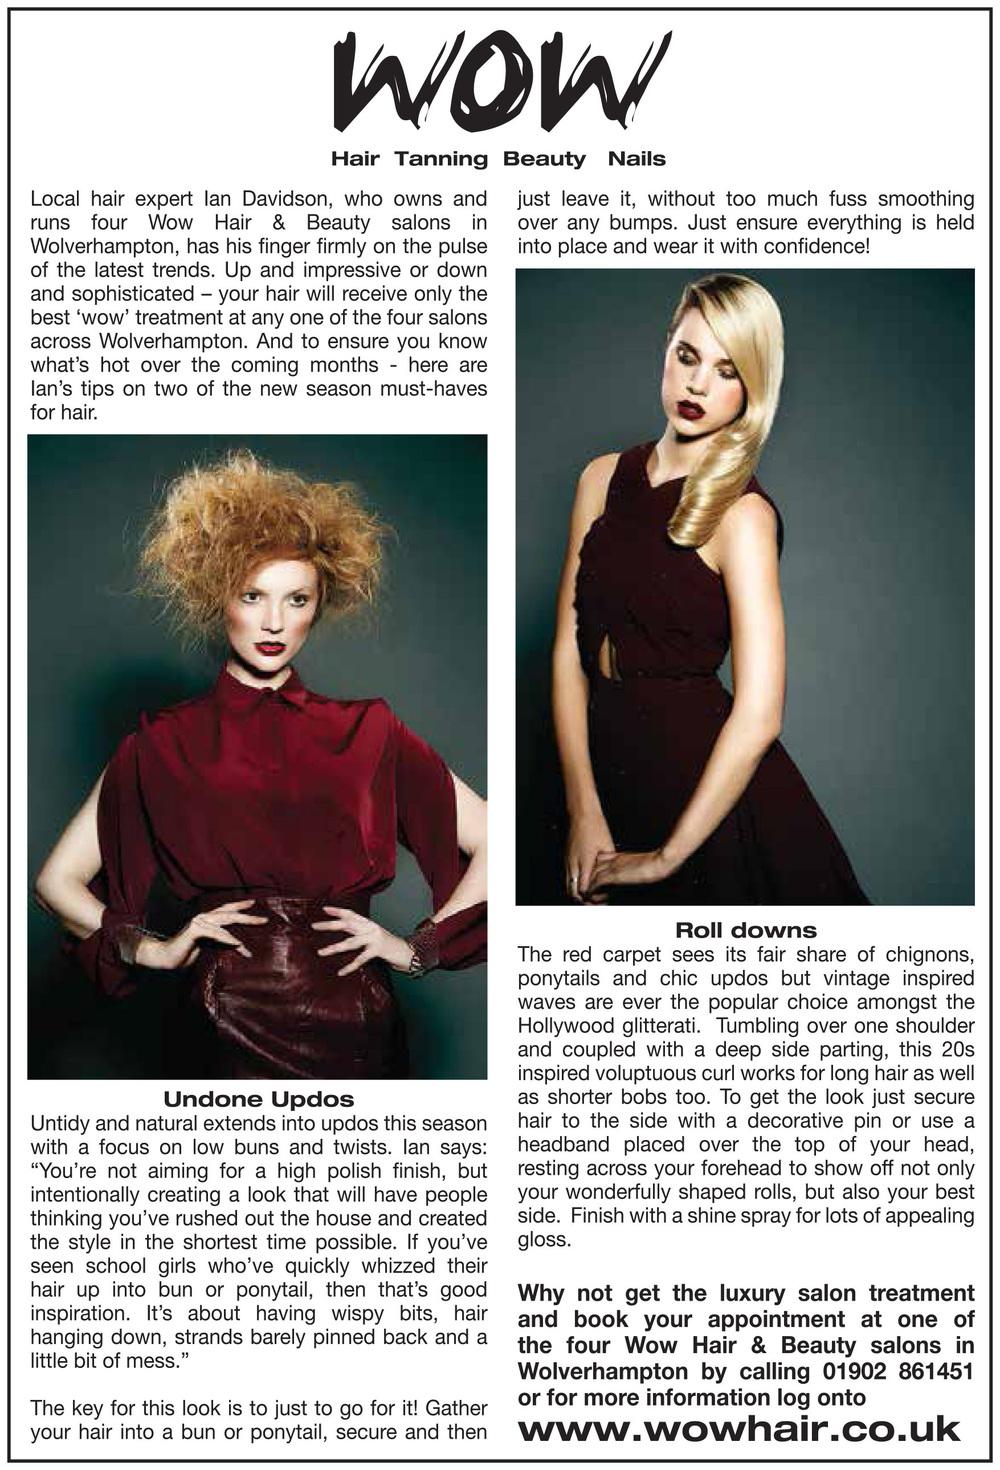 May-rep-WOW-Staffordshire-MayJune-2013-hair-trends.jpg